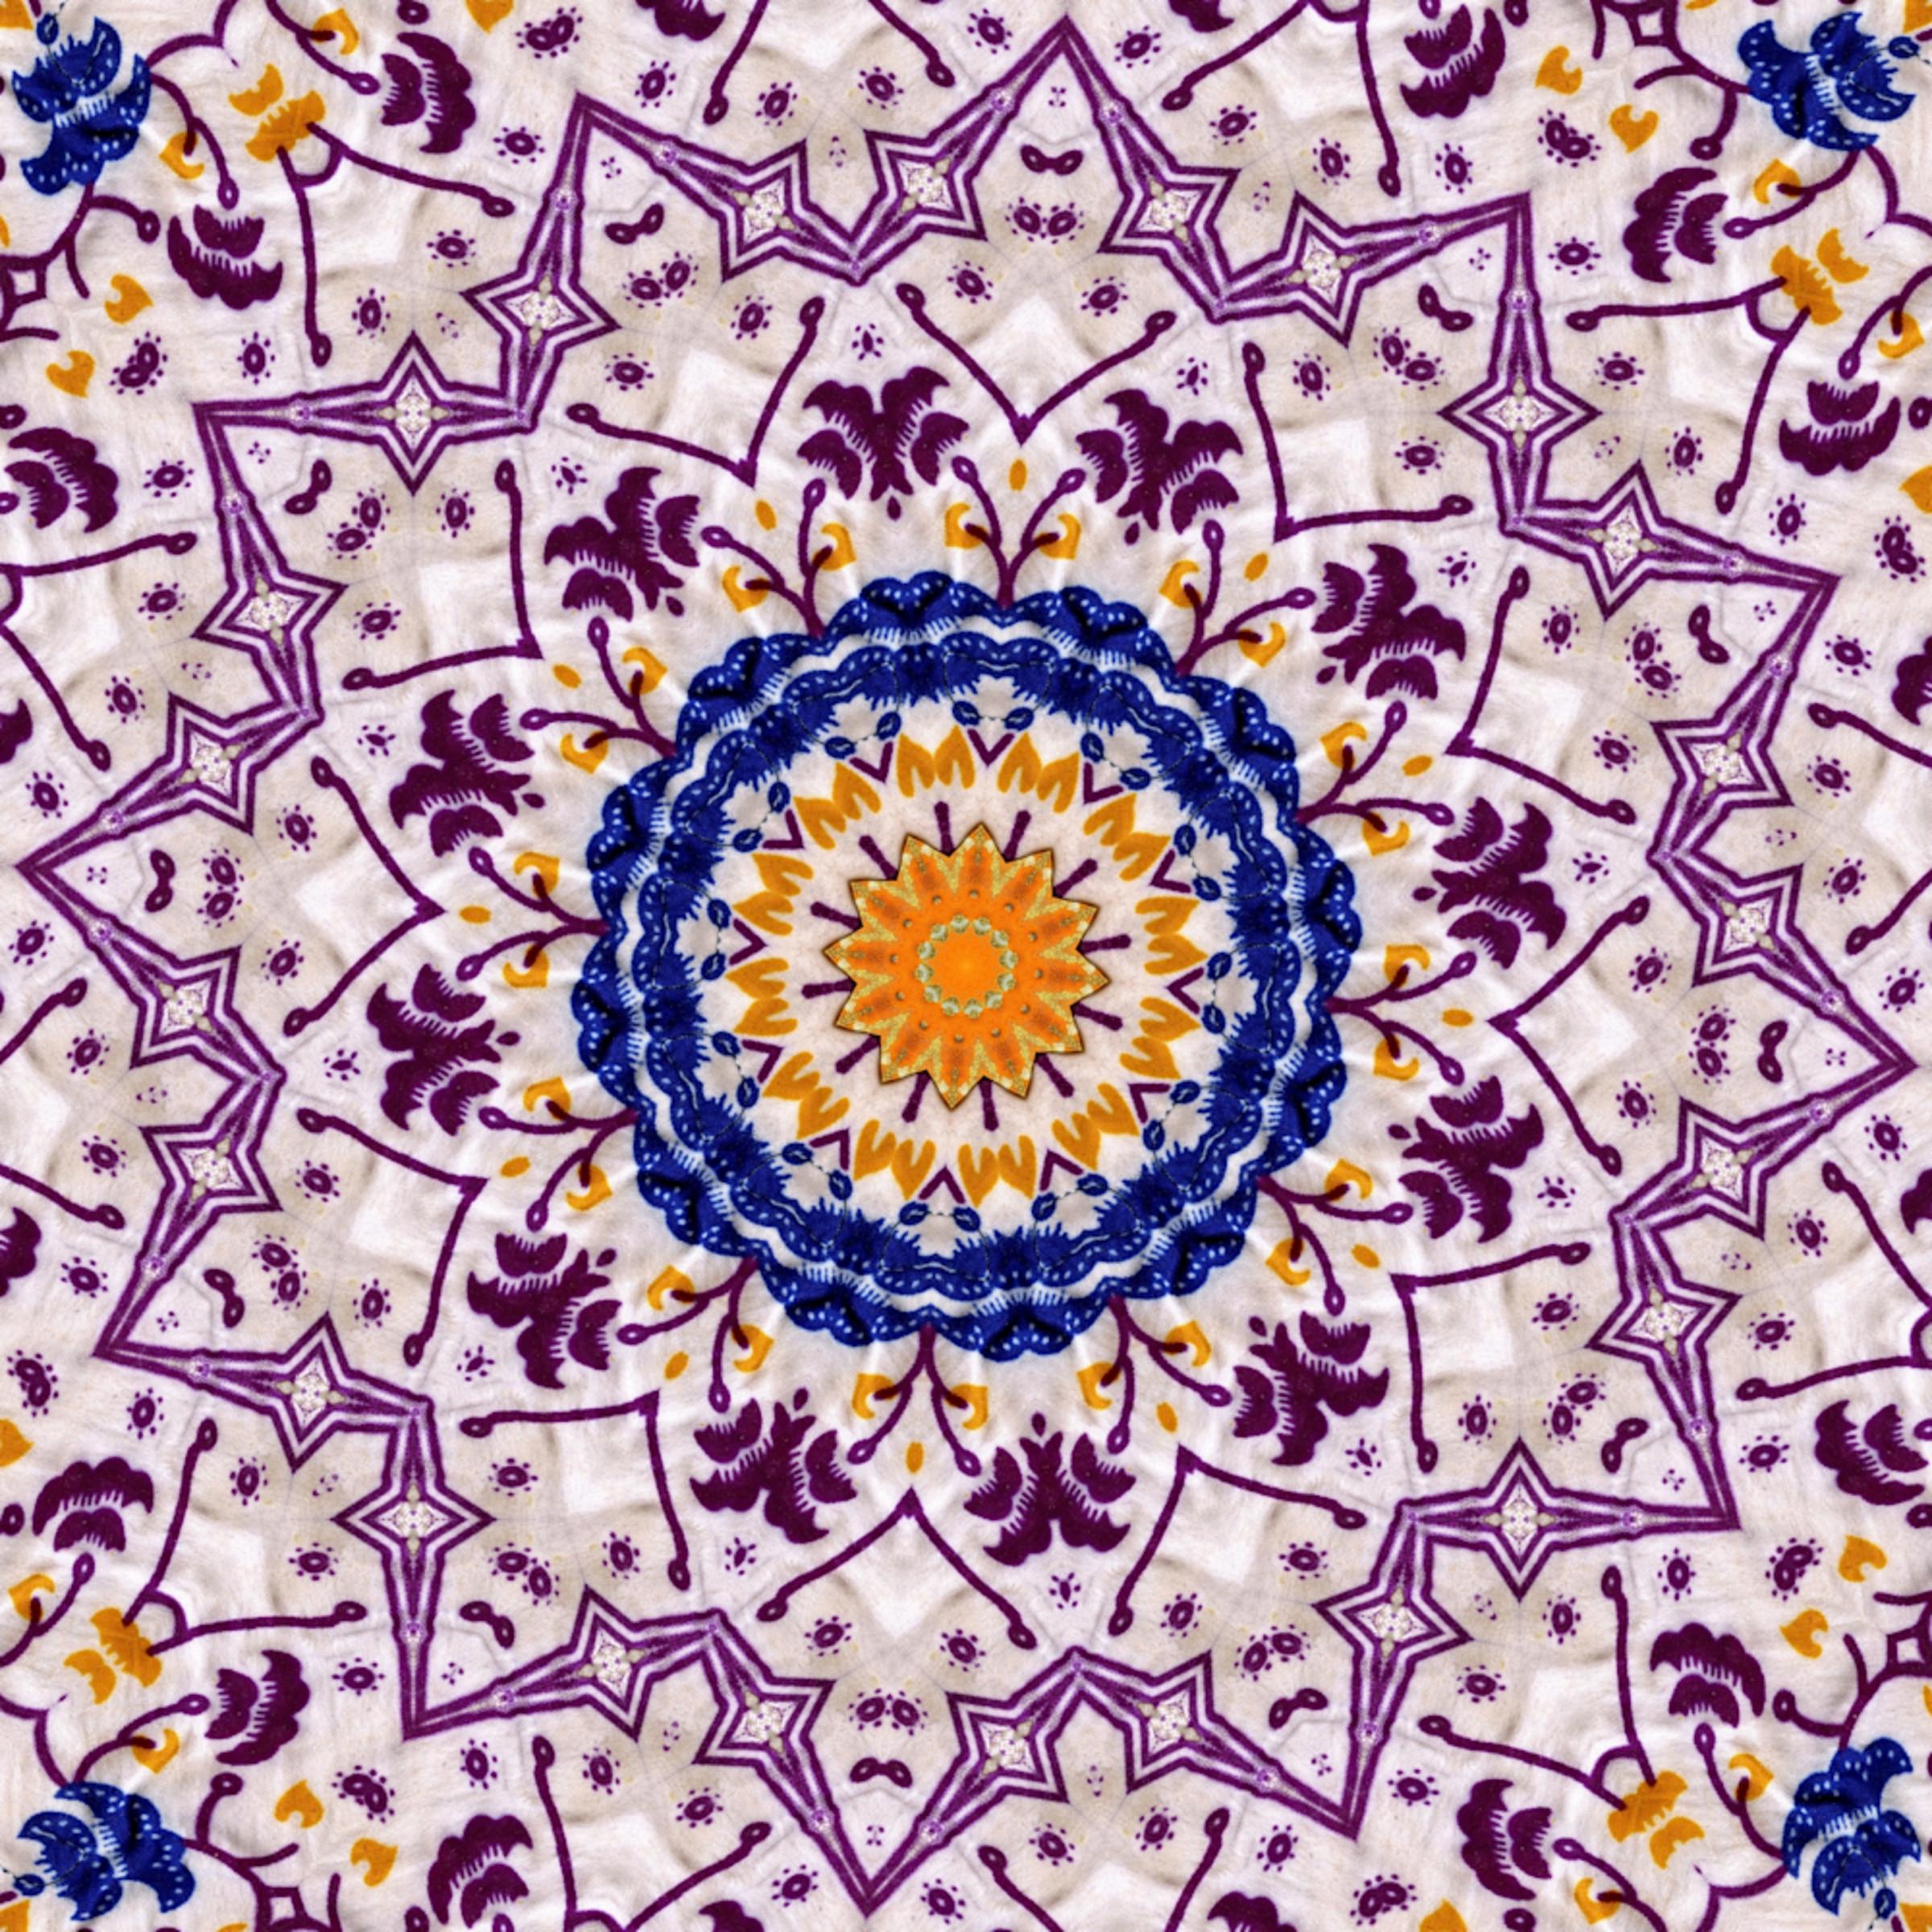 Kaleidoscopics 253 p9k36e